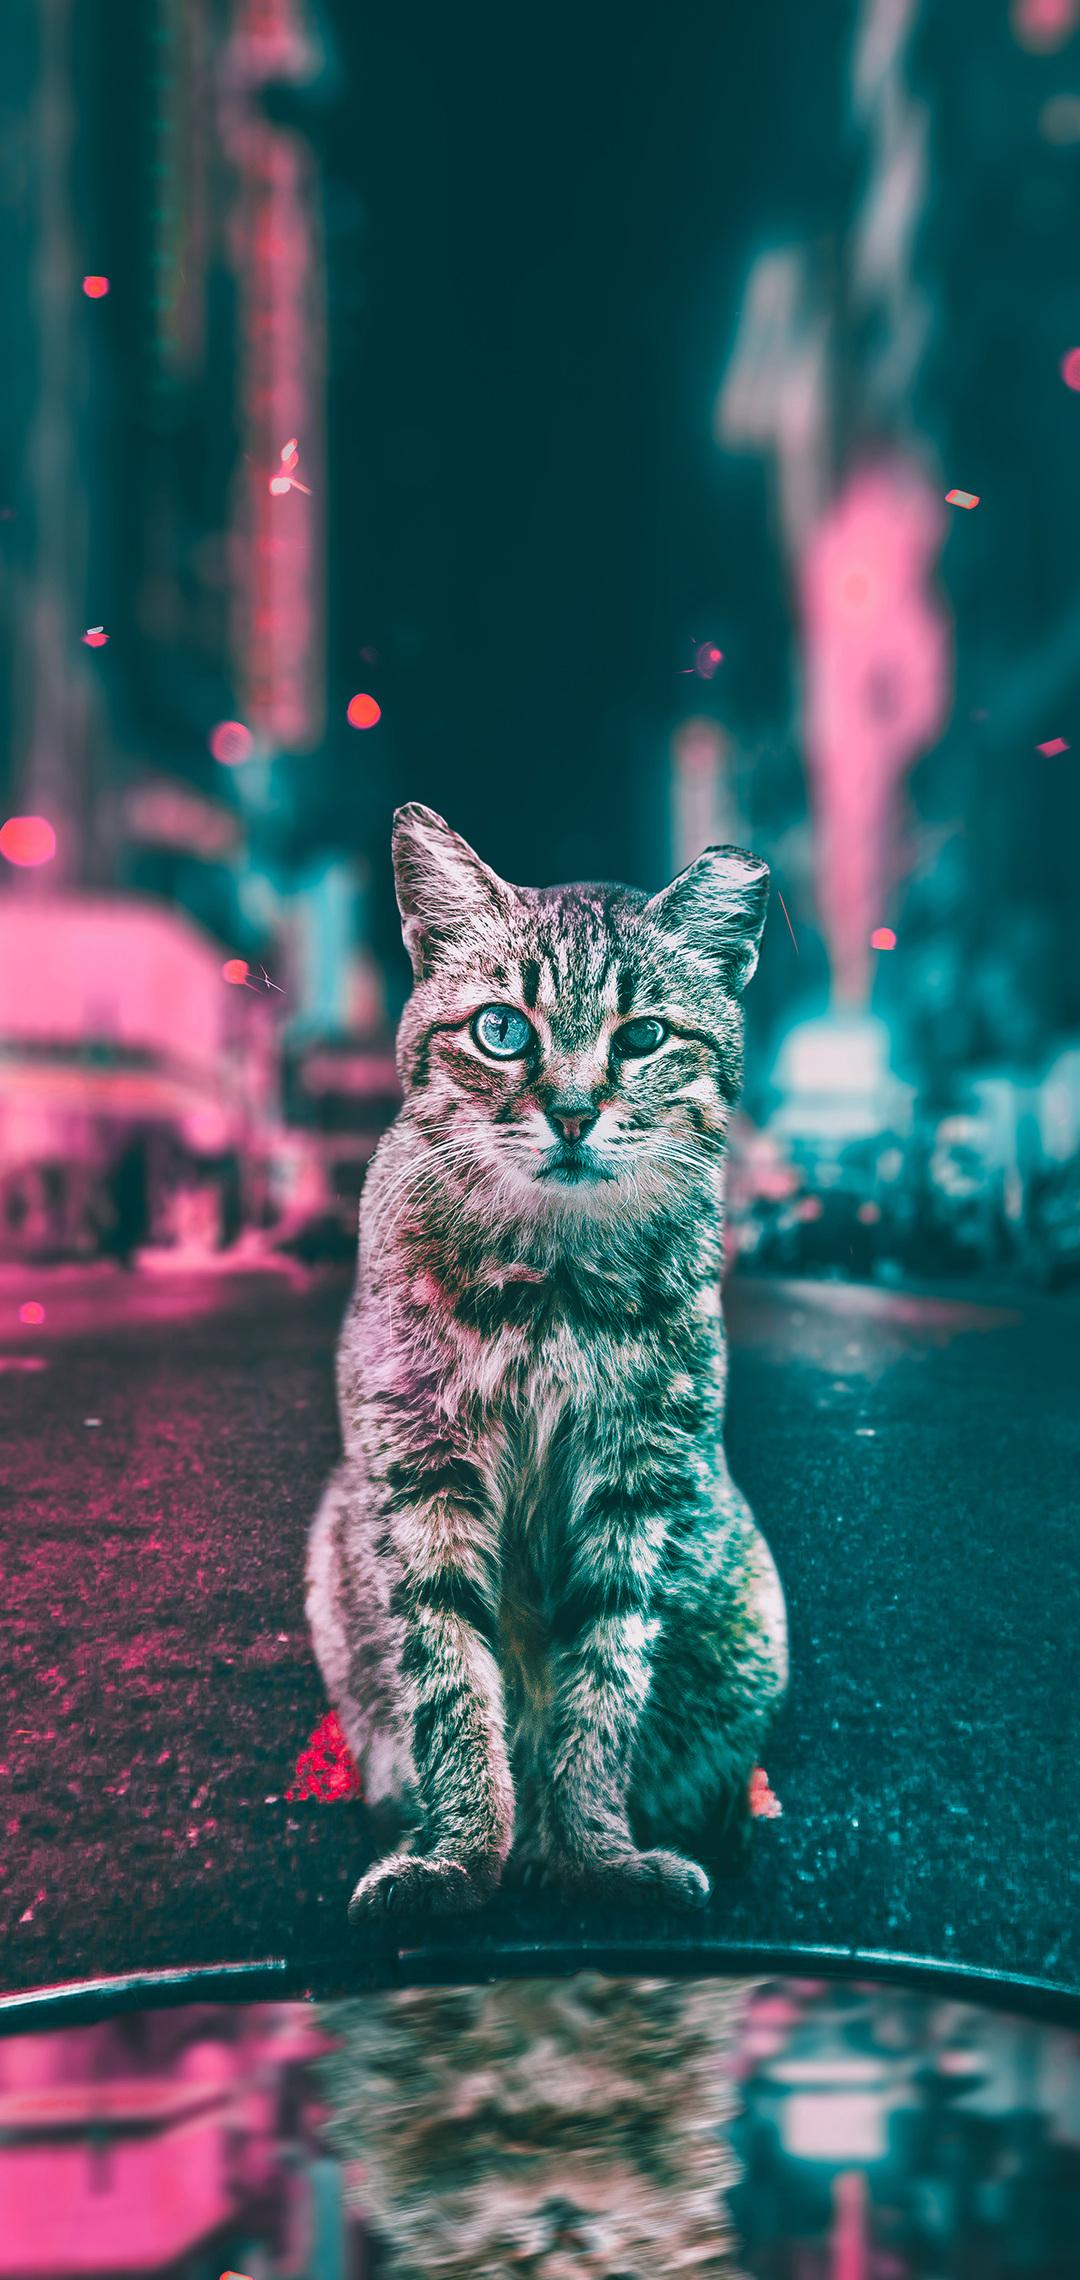 cat-road-lights-gy.jpg